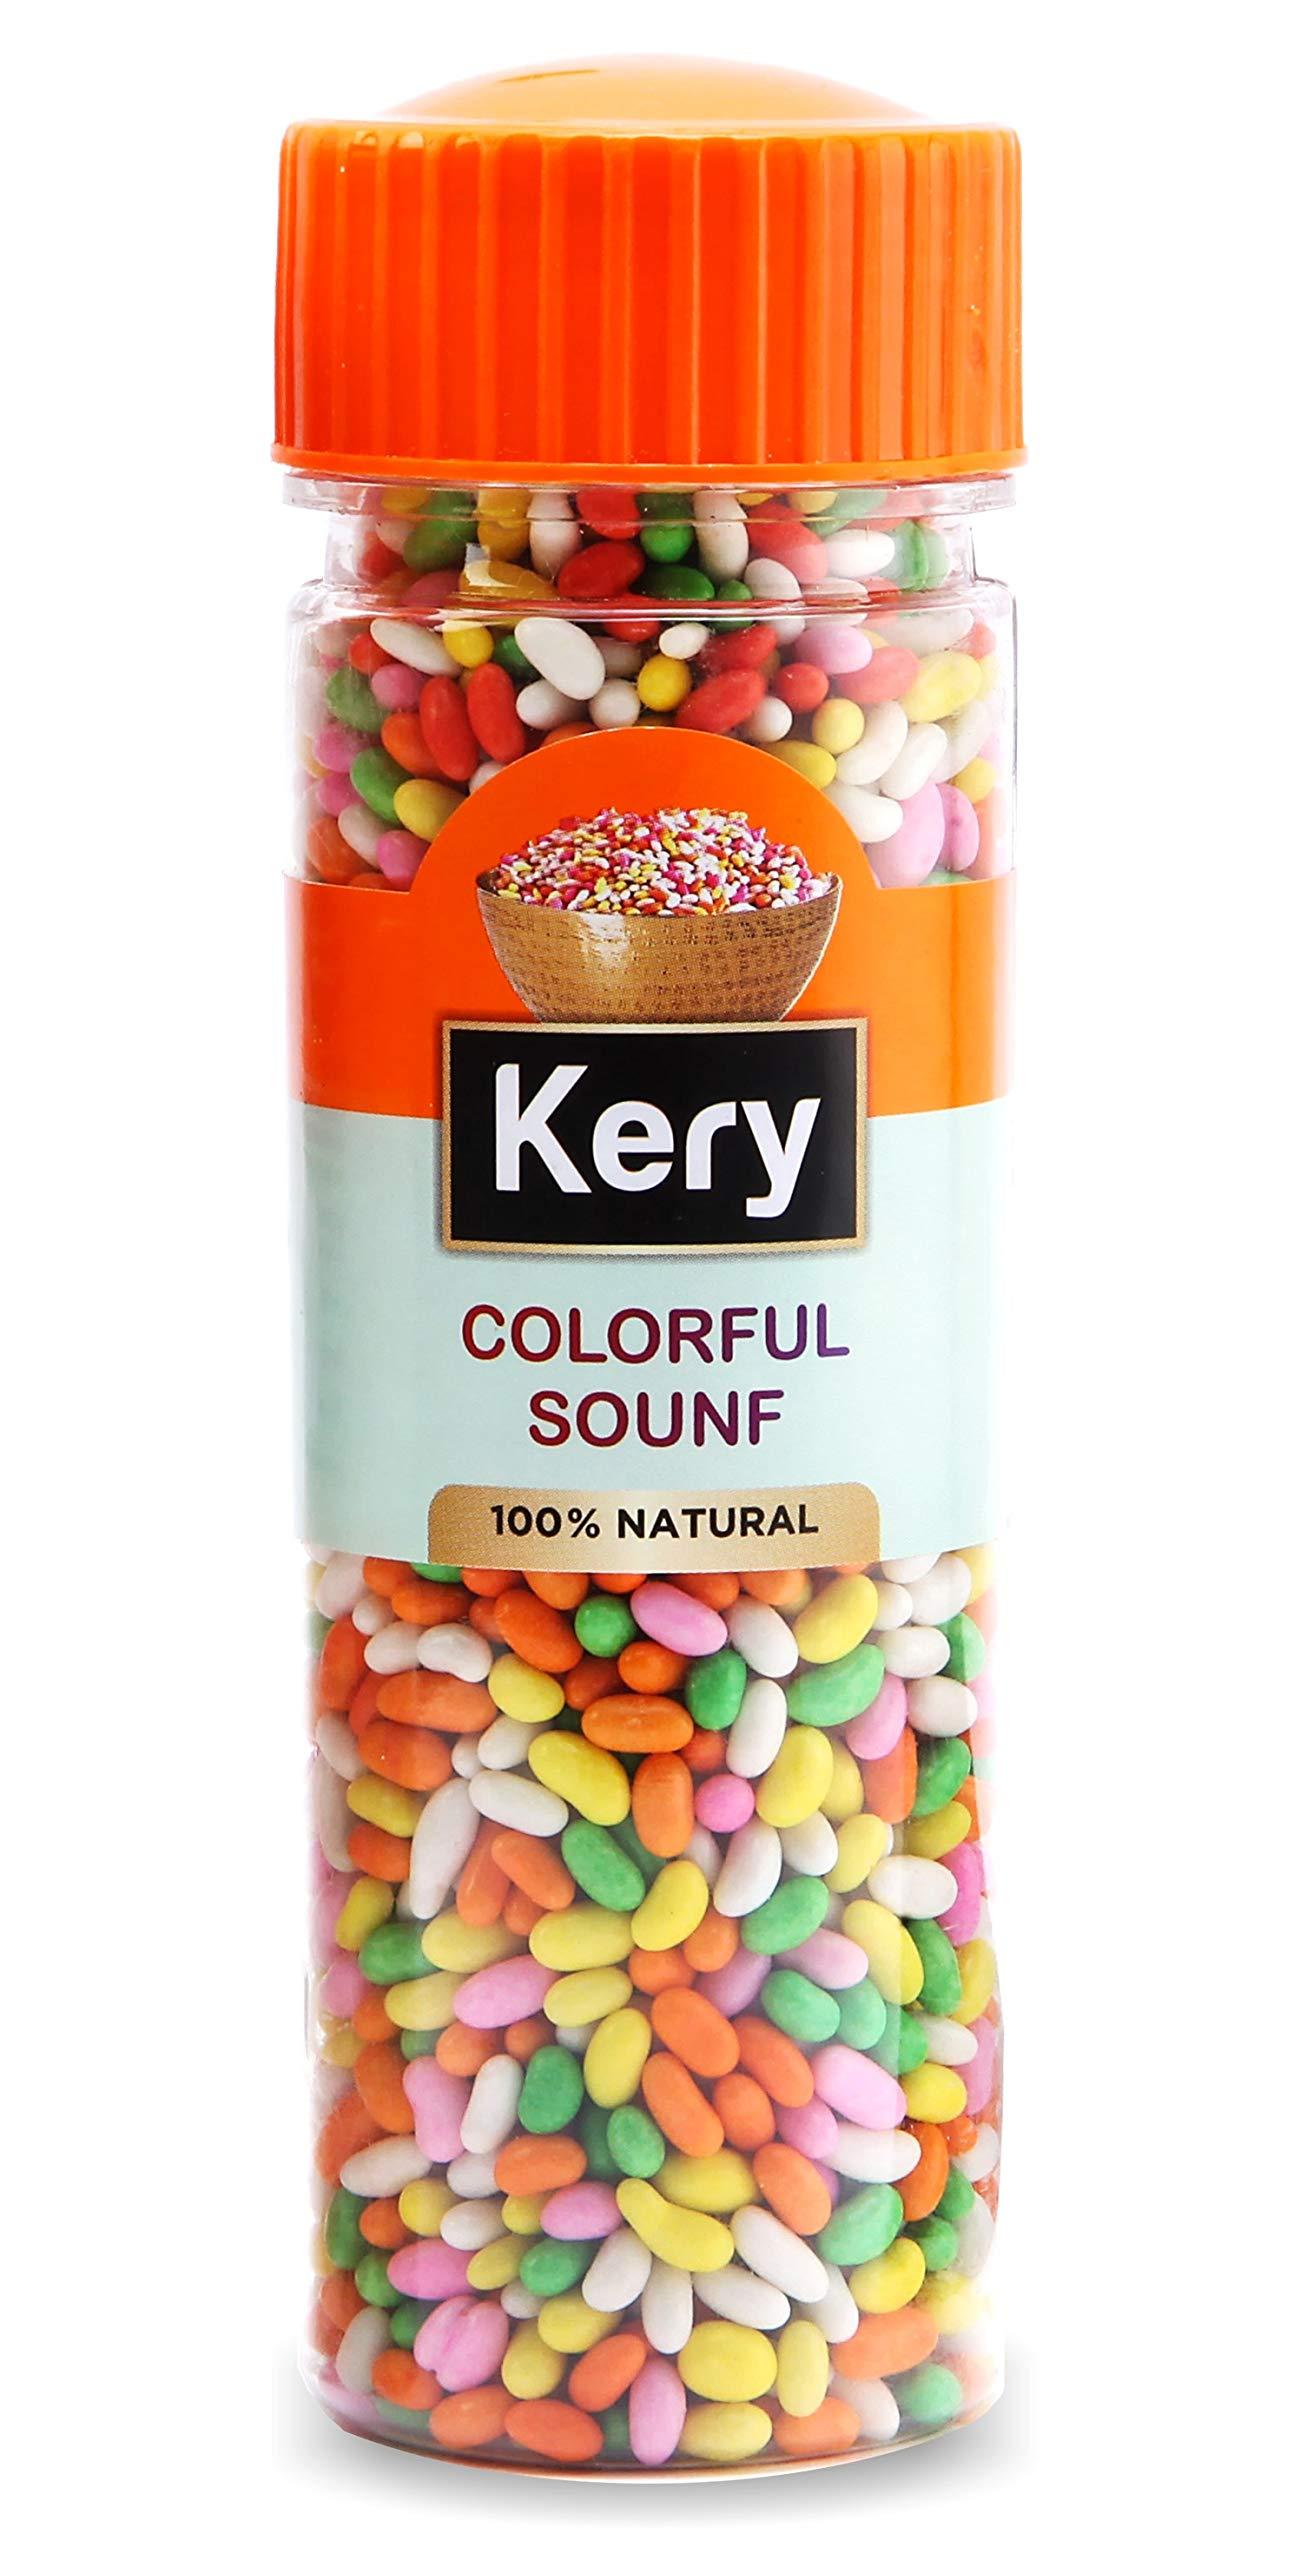 Kery Colorful Saunf Mouth Freshener, 1 Bottle, 130g (Sugar Coated Fennel Sonf Mukhwas)